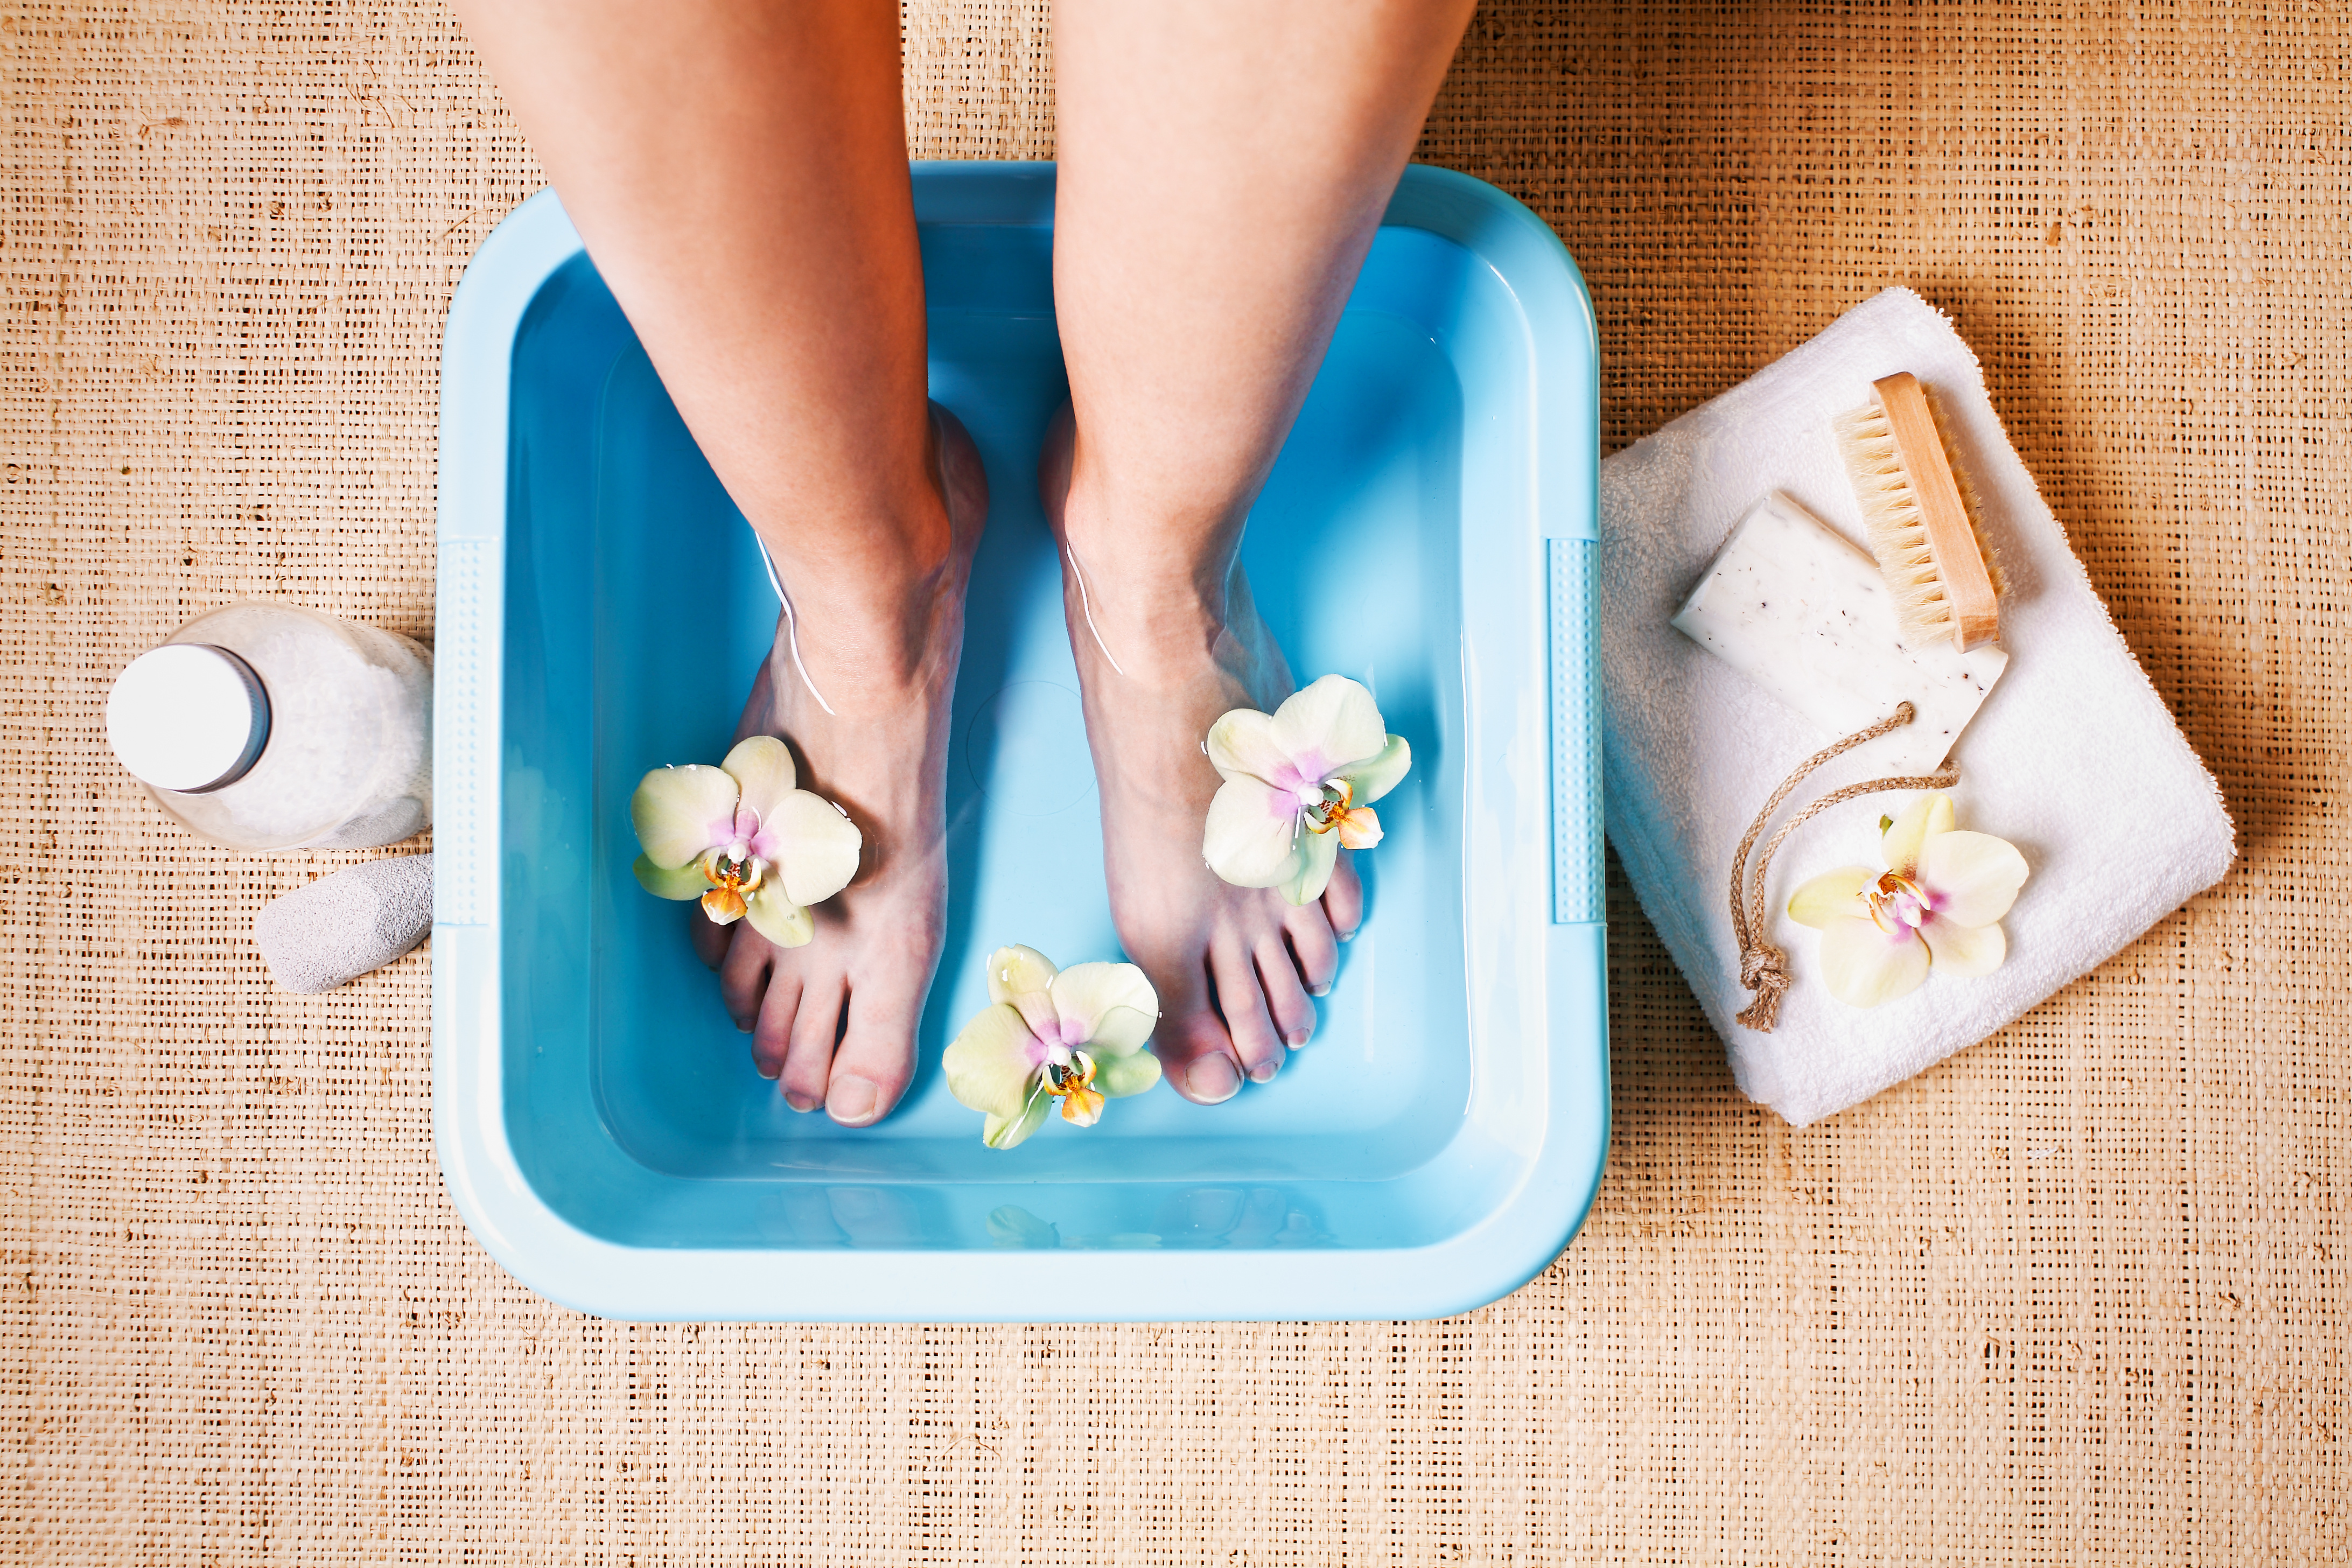 Fußbad Bei Erkältung Mit Salz